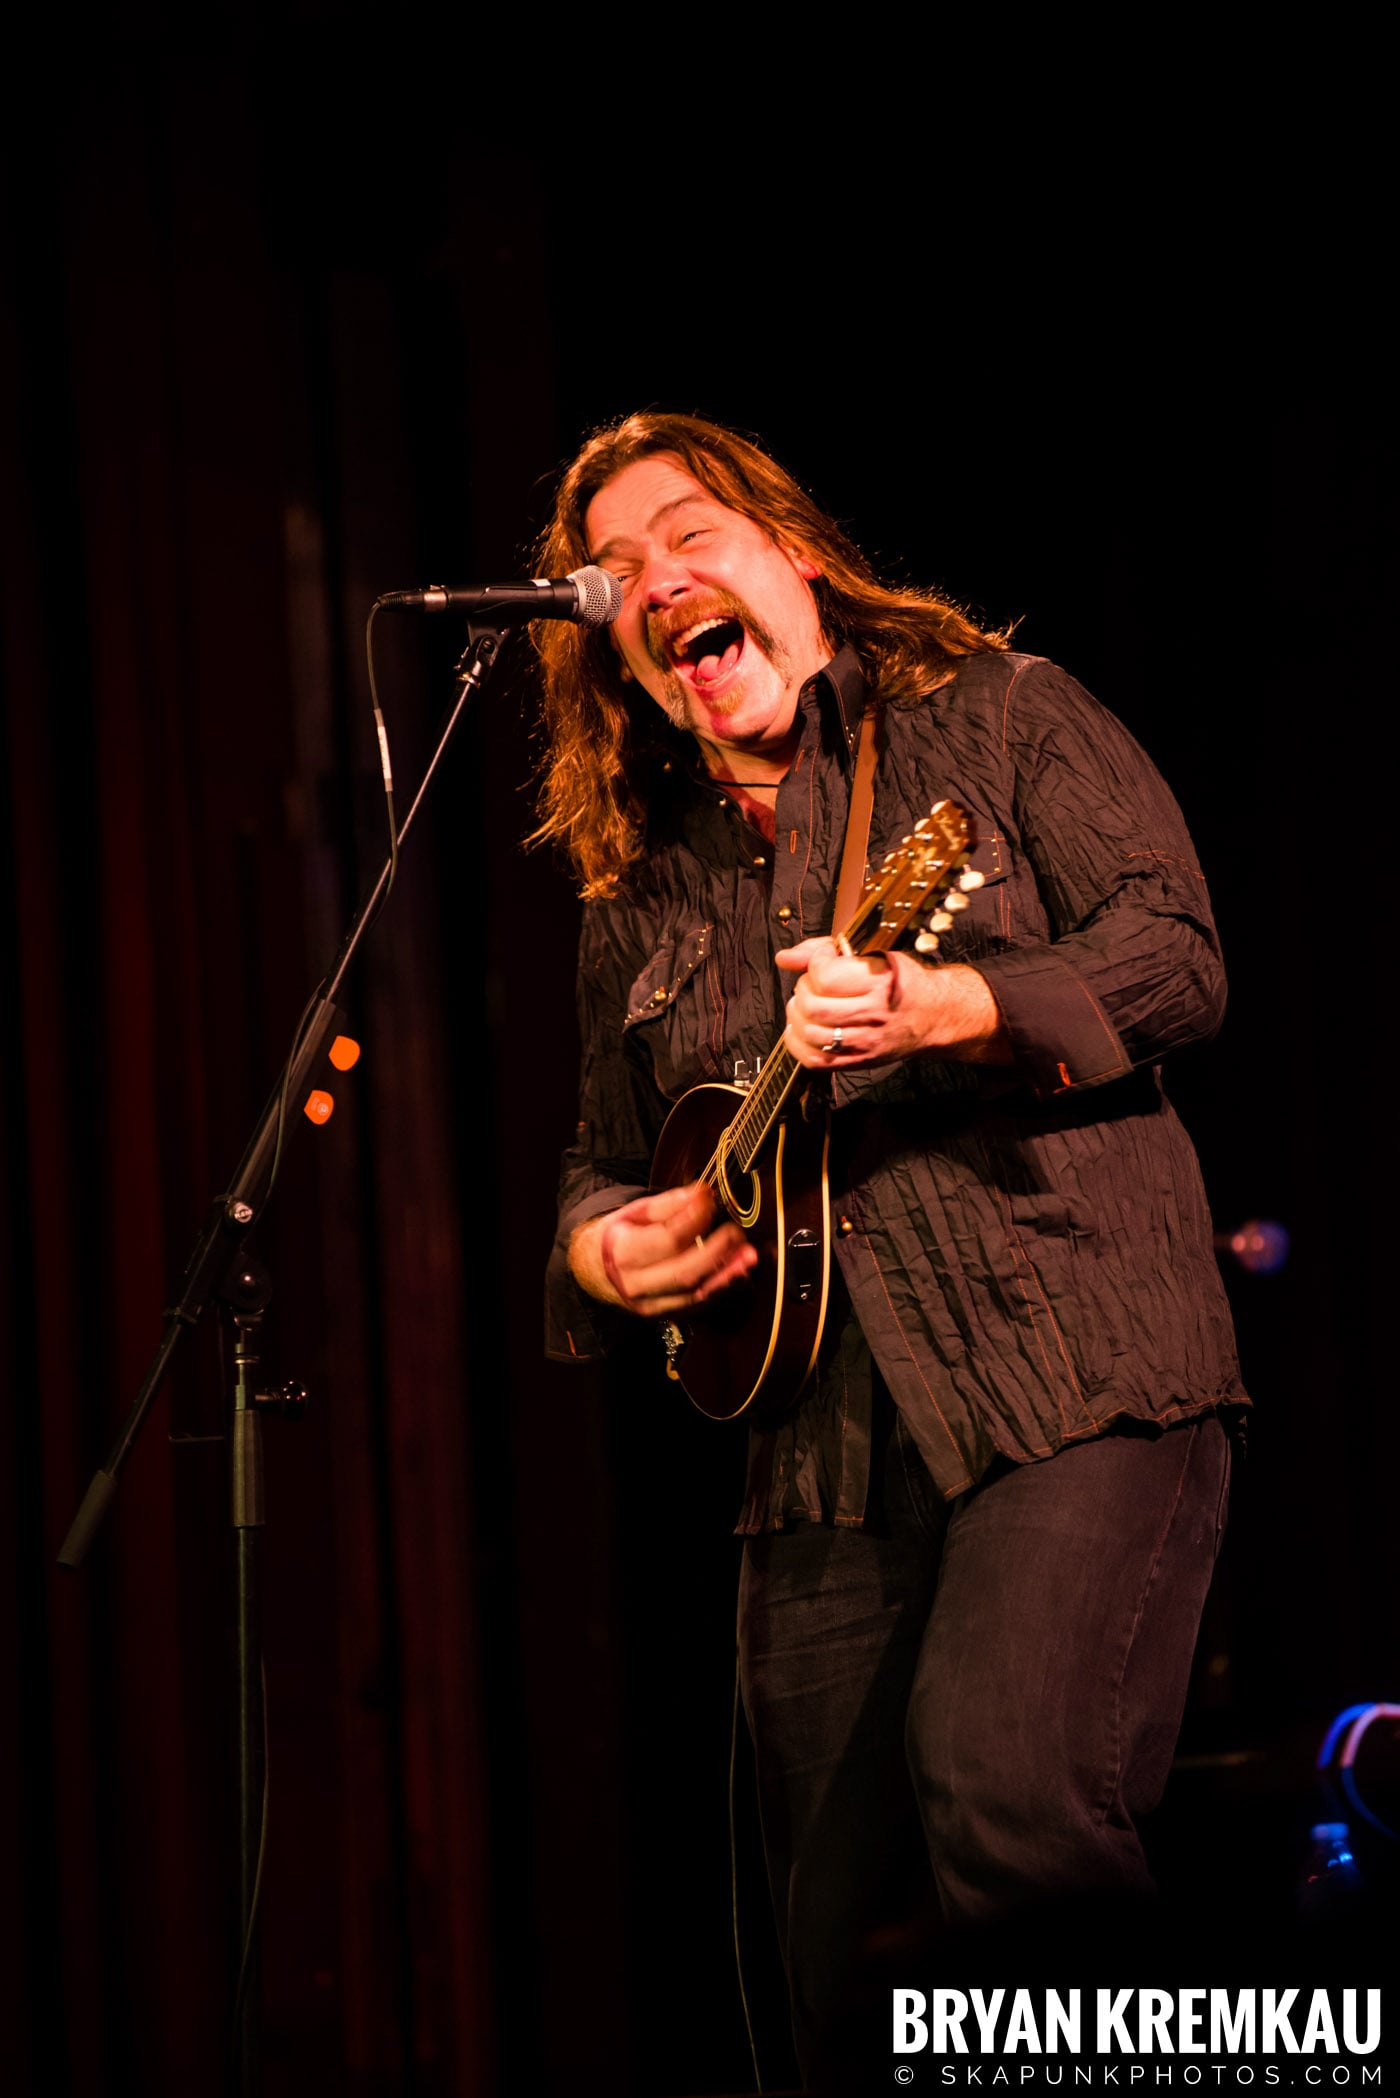 Alan Doyle @ B.B. King Blues & Grill, NYC - 1.11.13 (6)